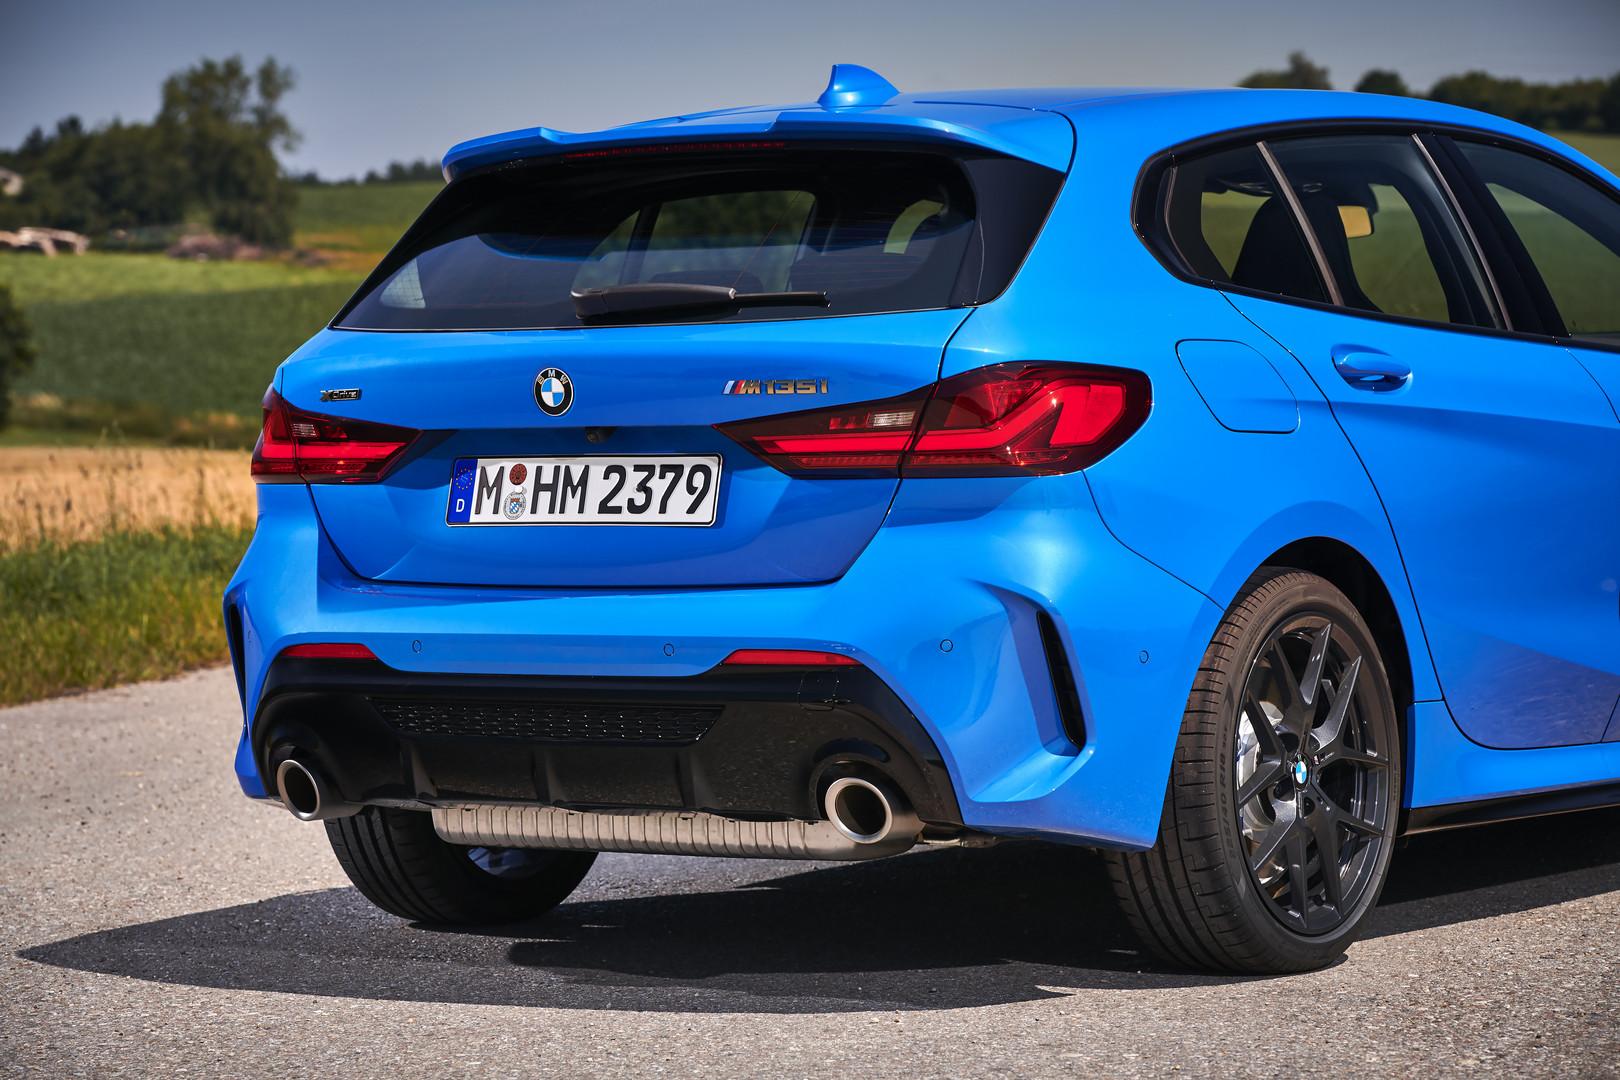 BMW M135i dual exhaust